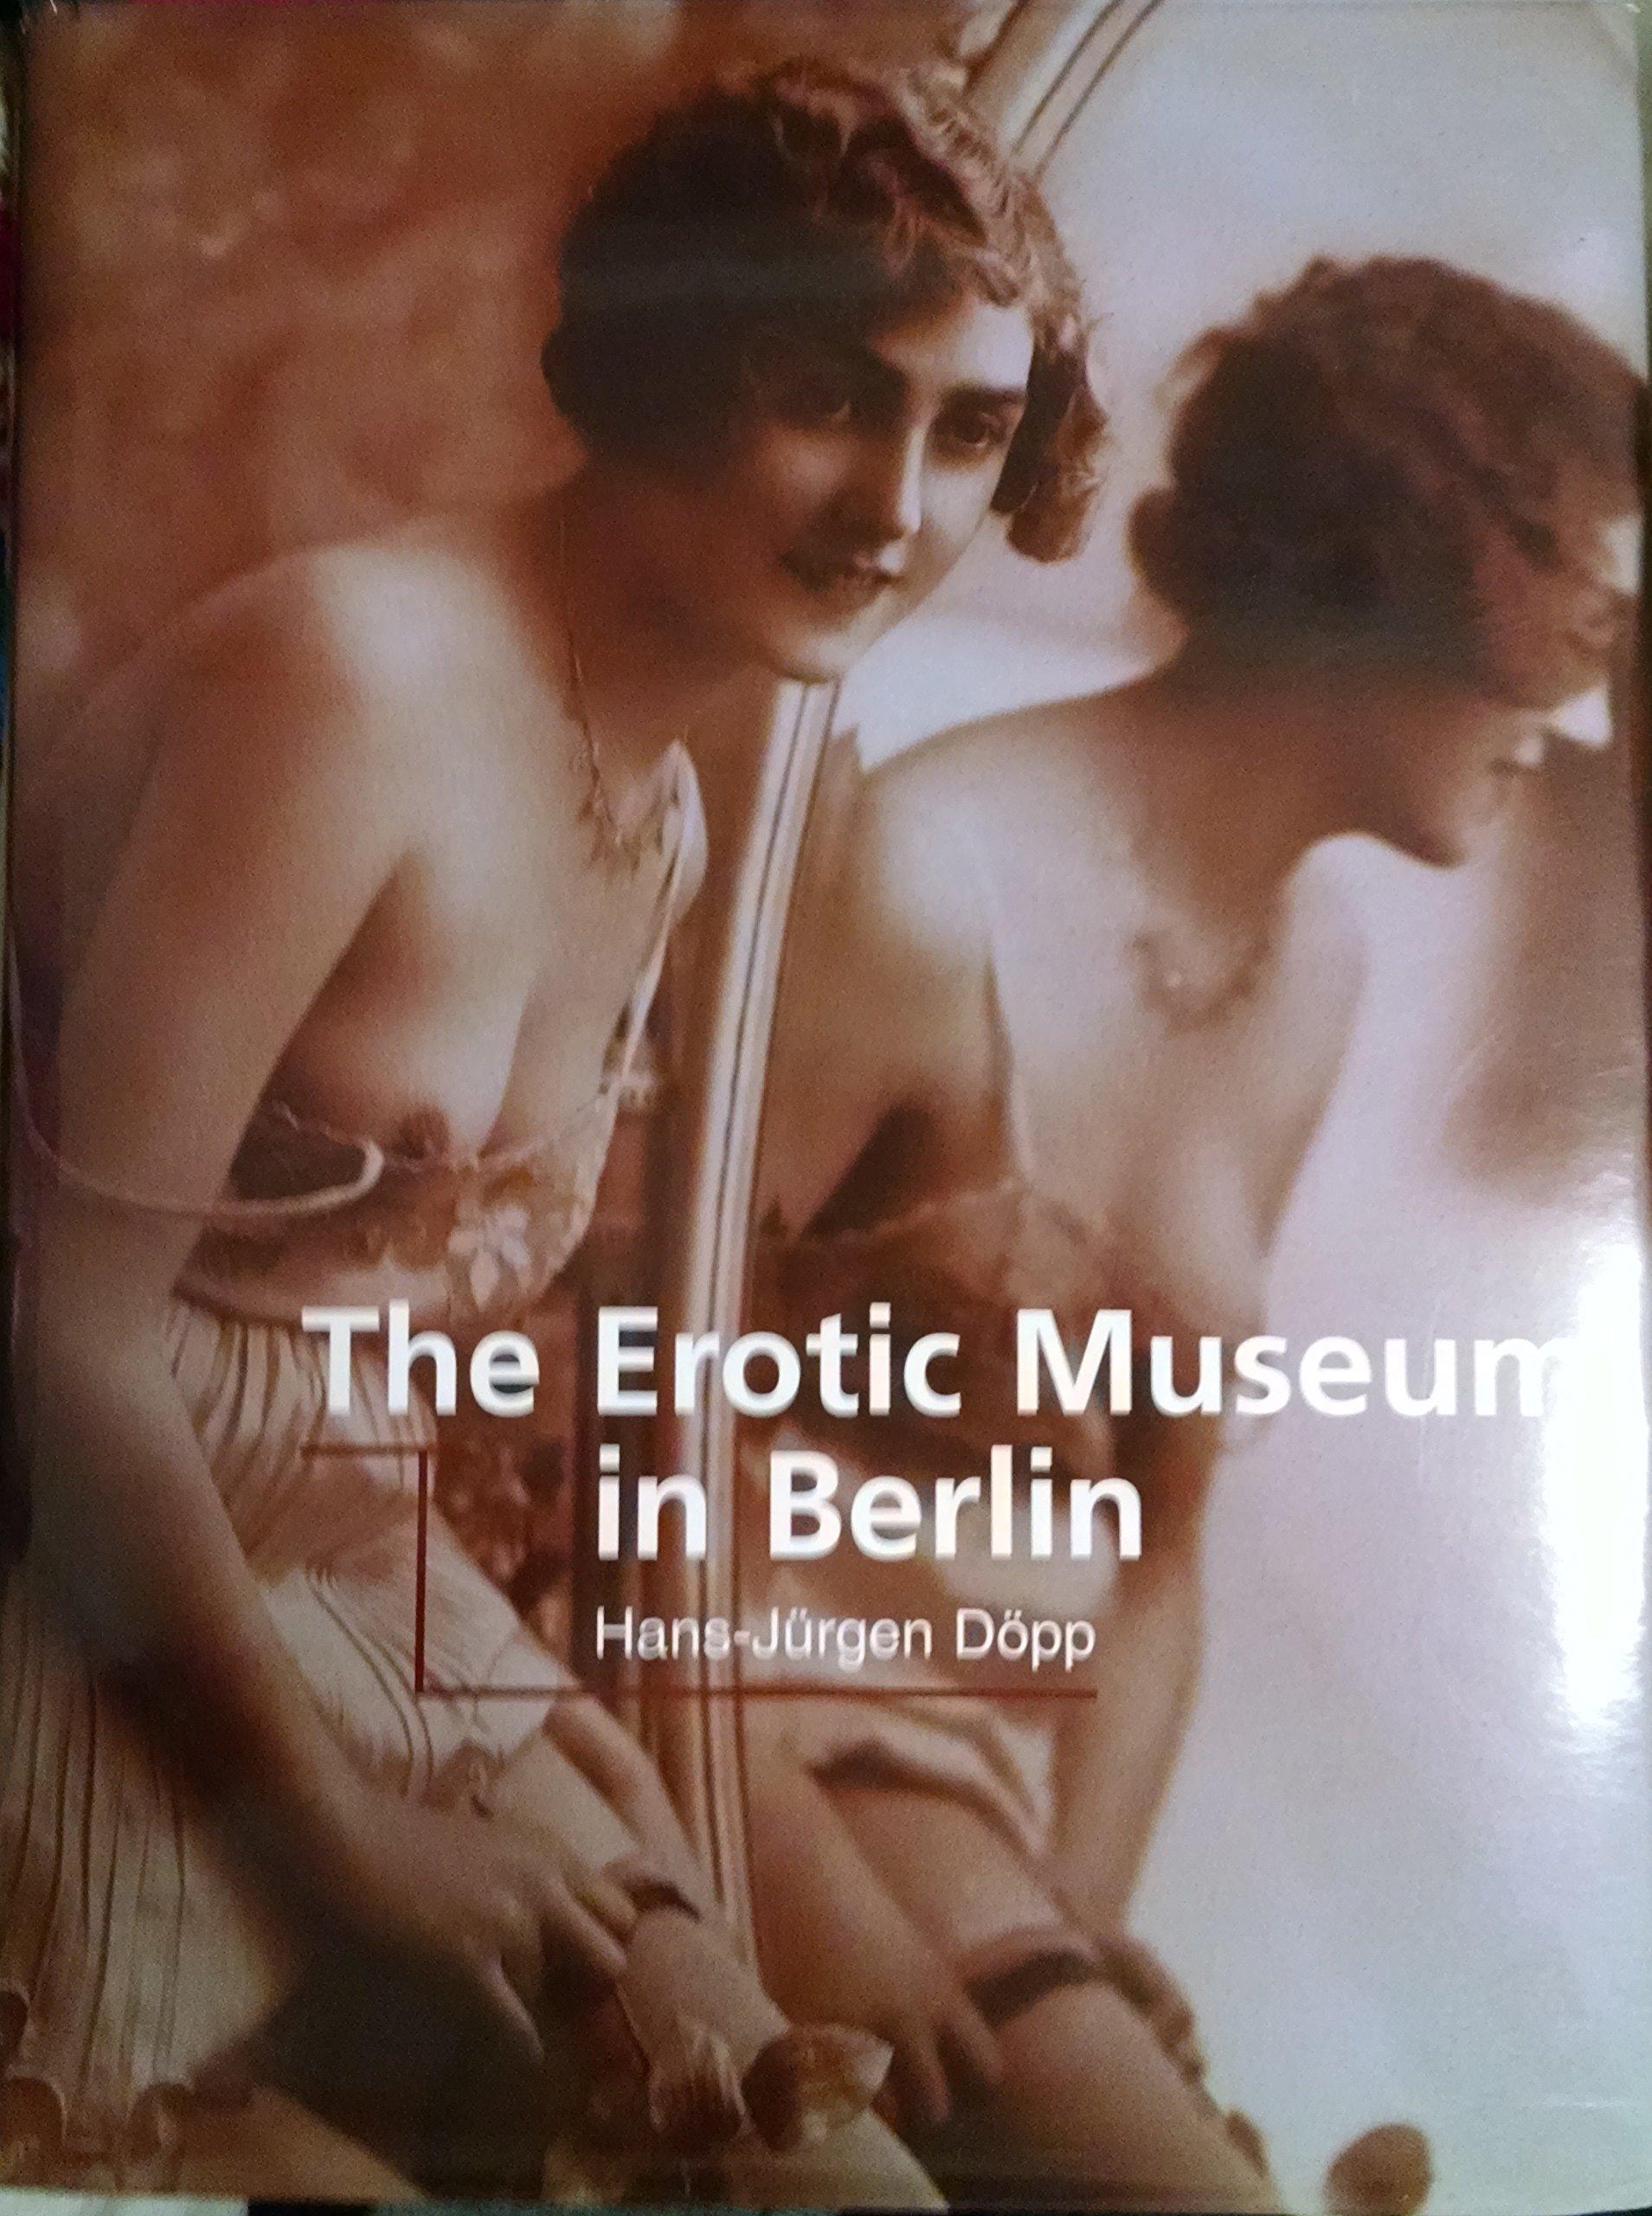 Erotica museam berlin picture 405